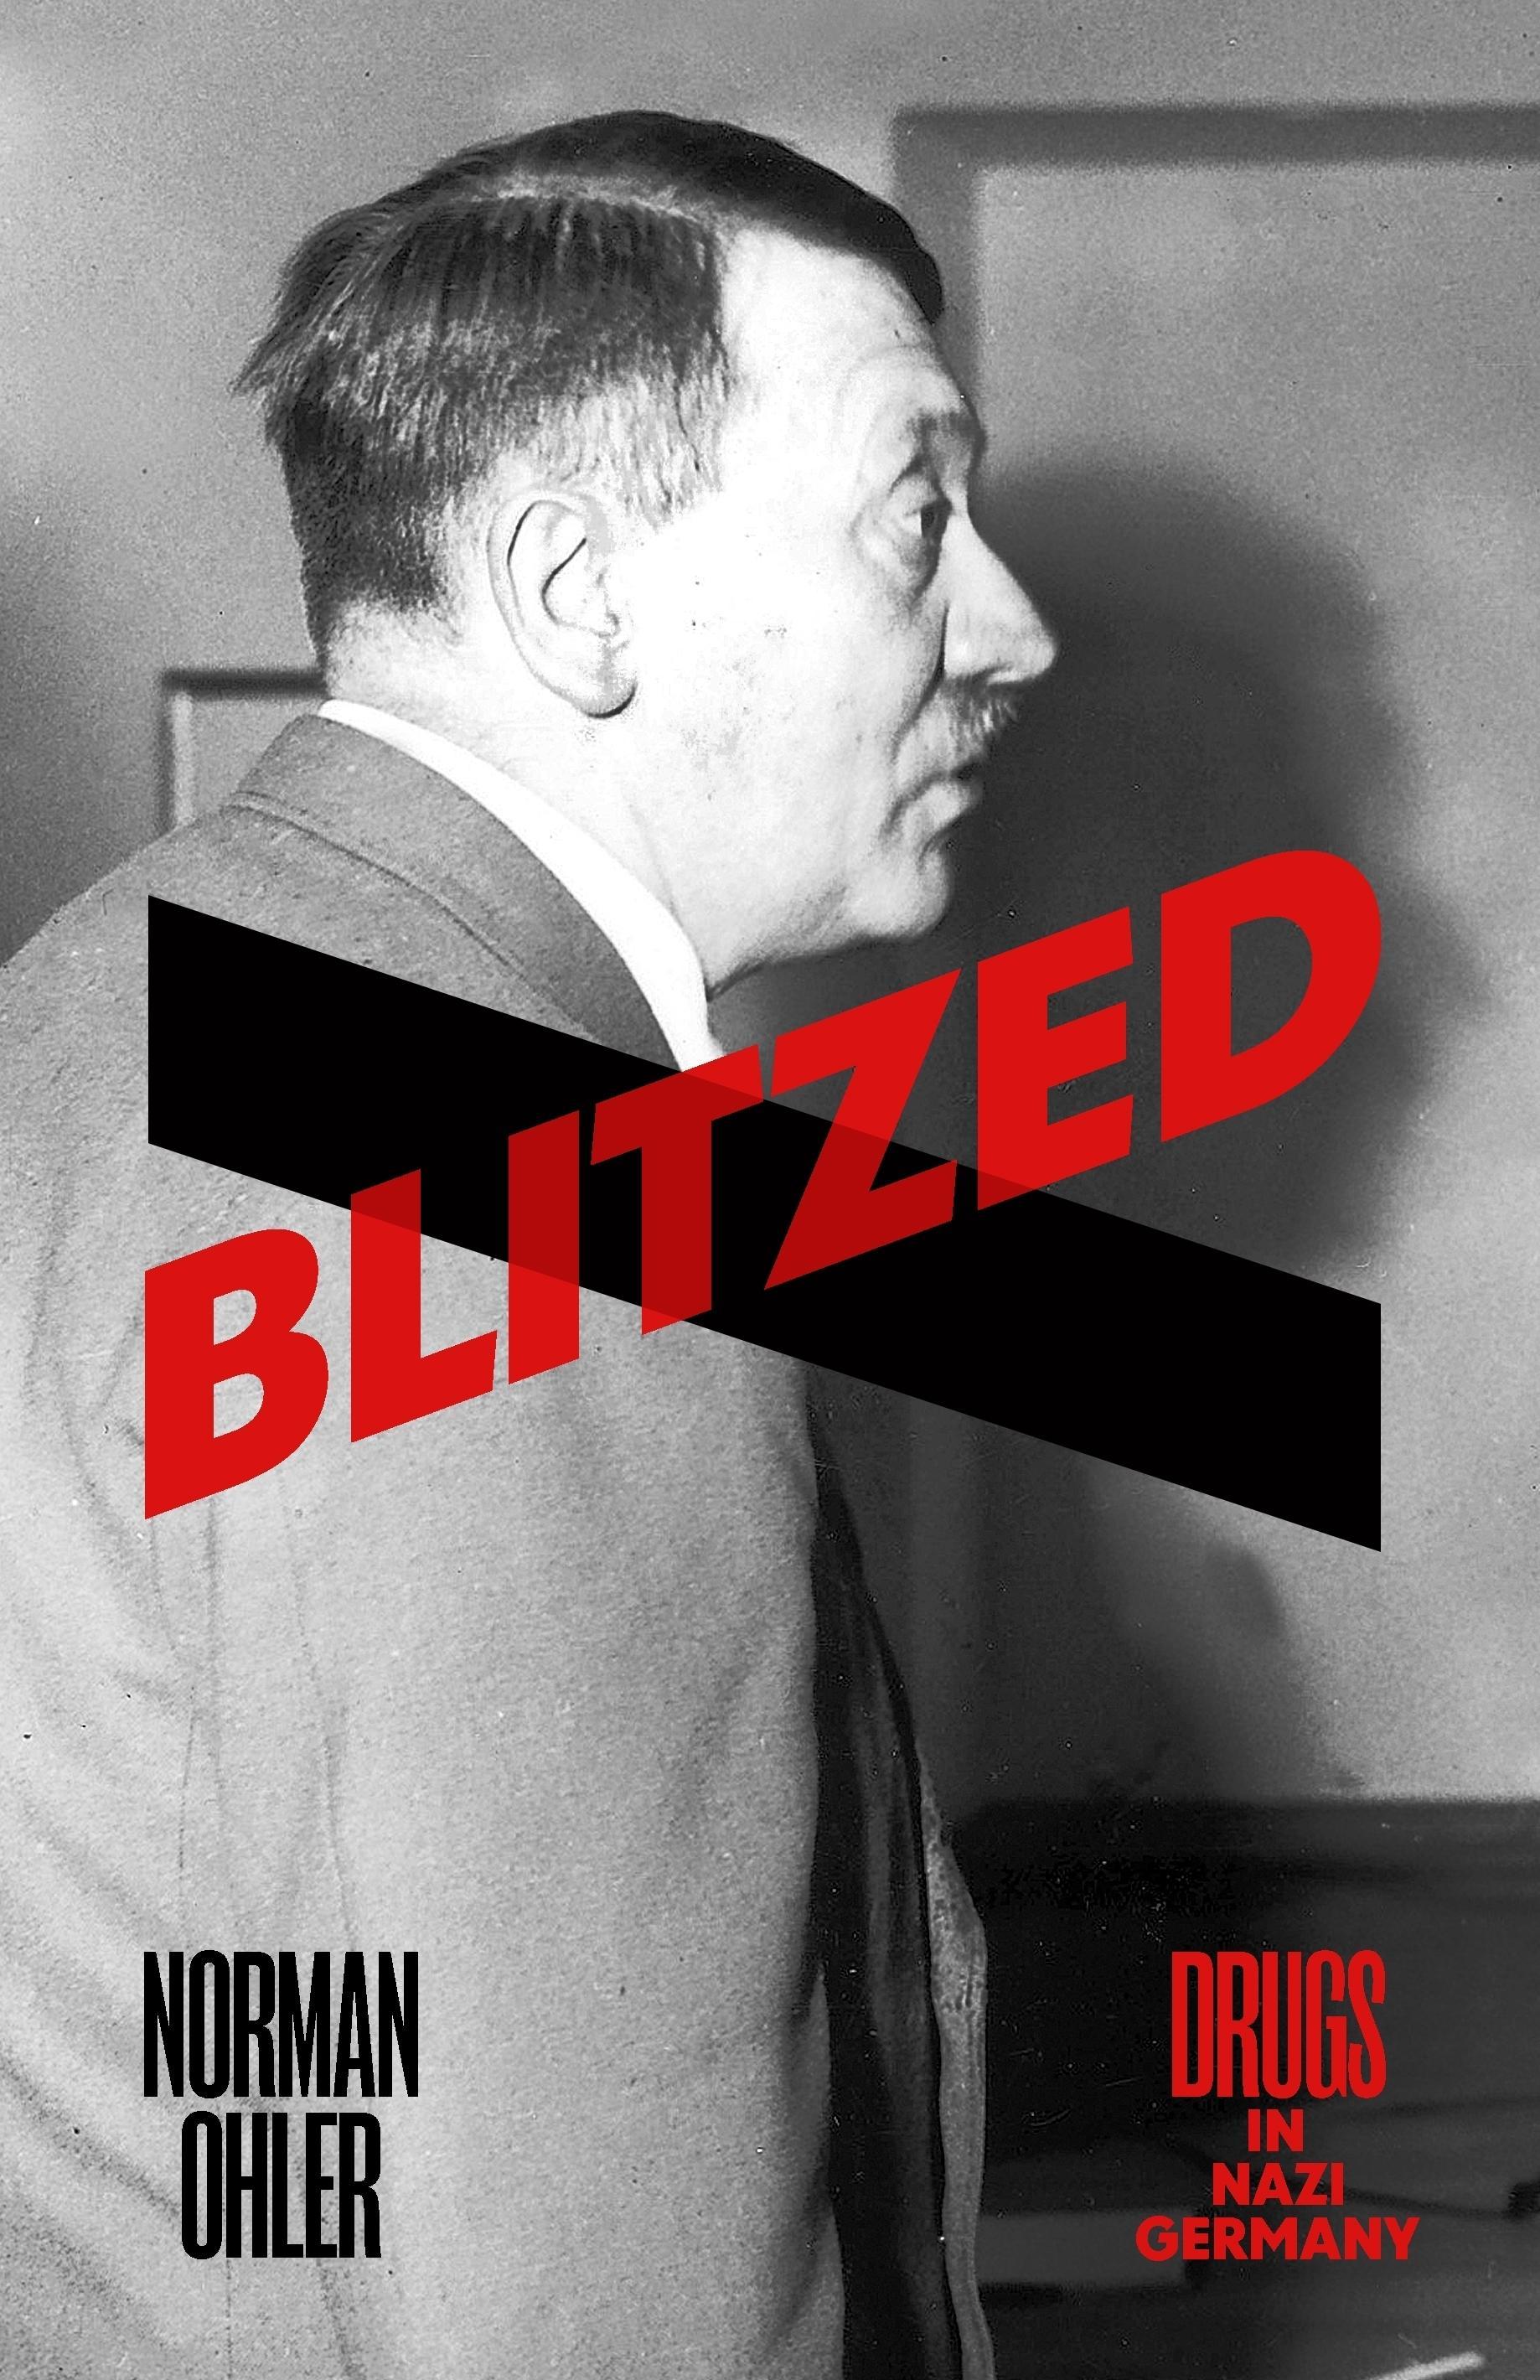 Blitzed: Drugs inNaziGermany